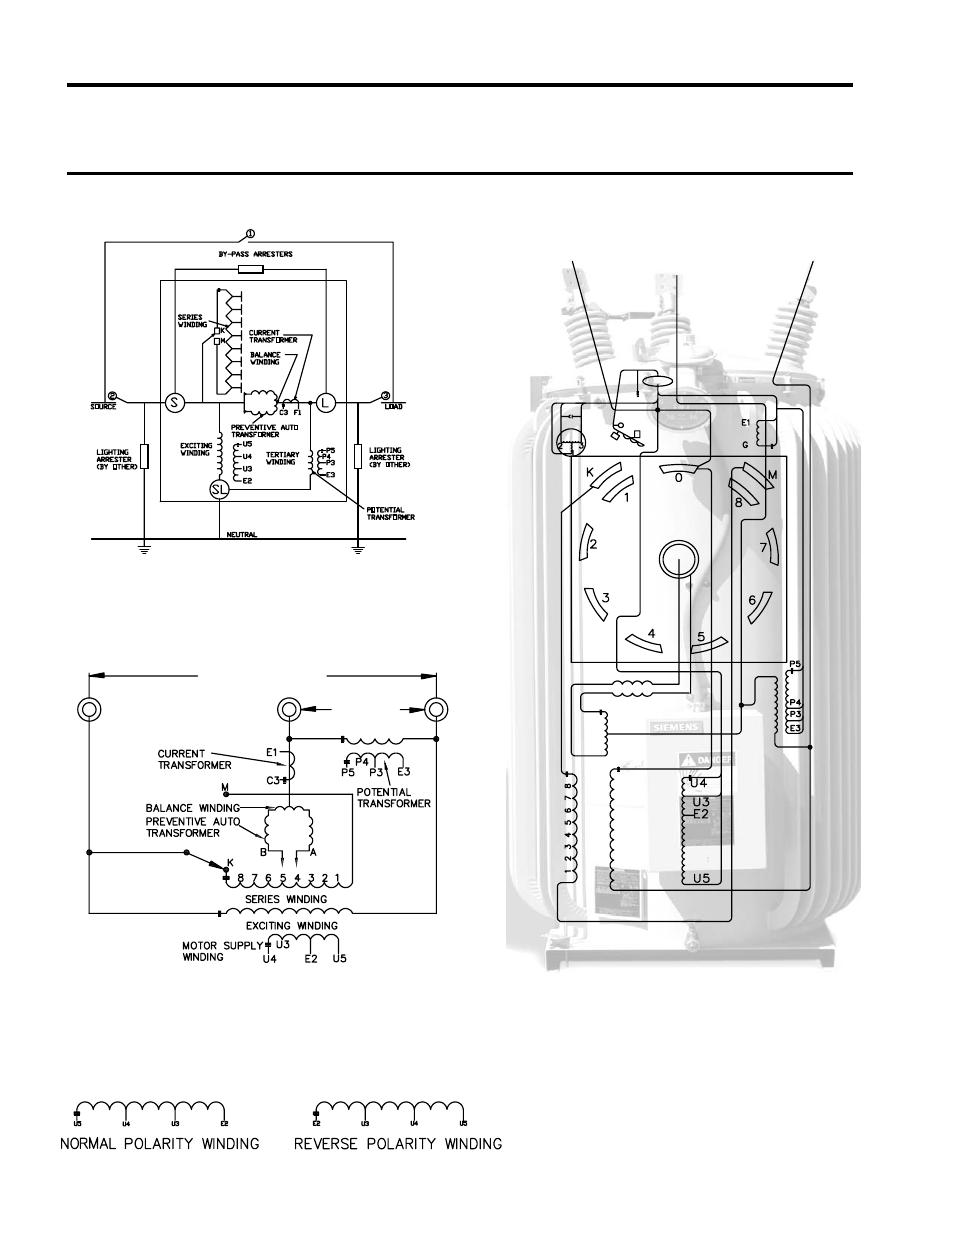 hight resolution of connection diagrams siemens jfr distribution step voltage regulator 21 115532 001 user manual